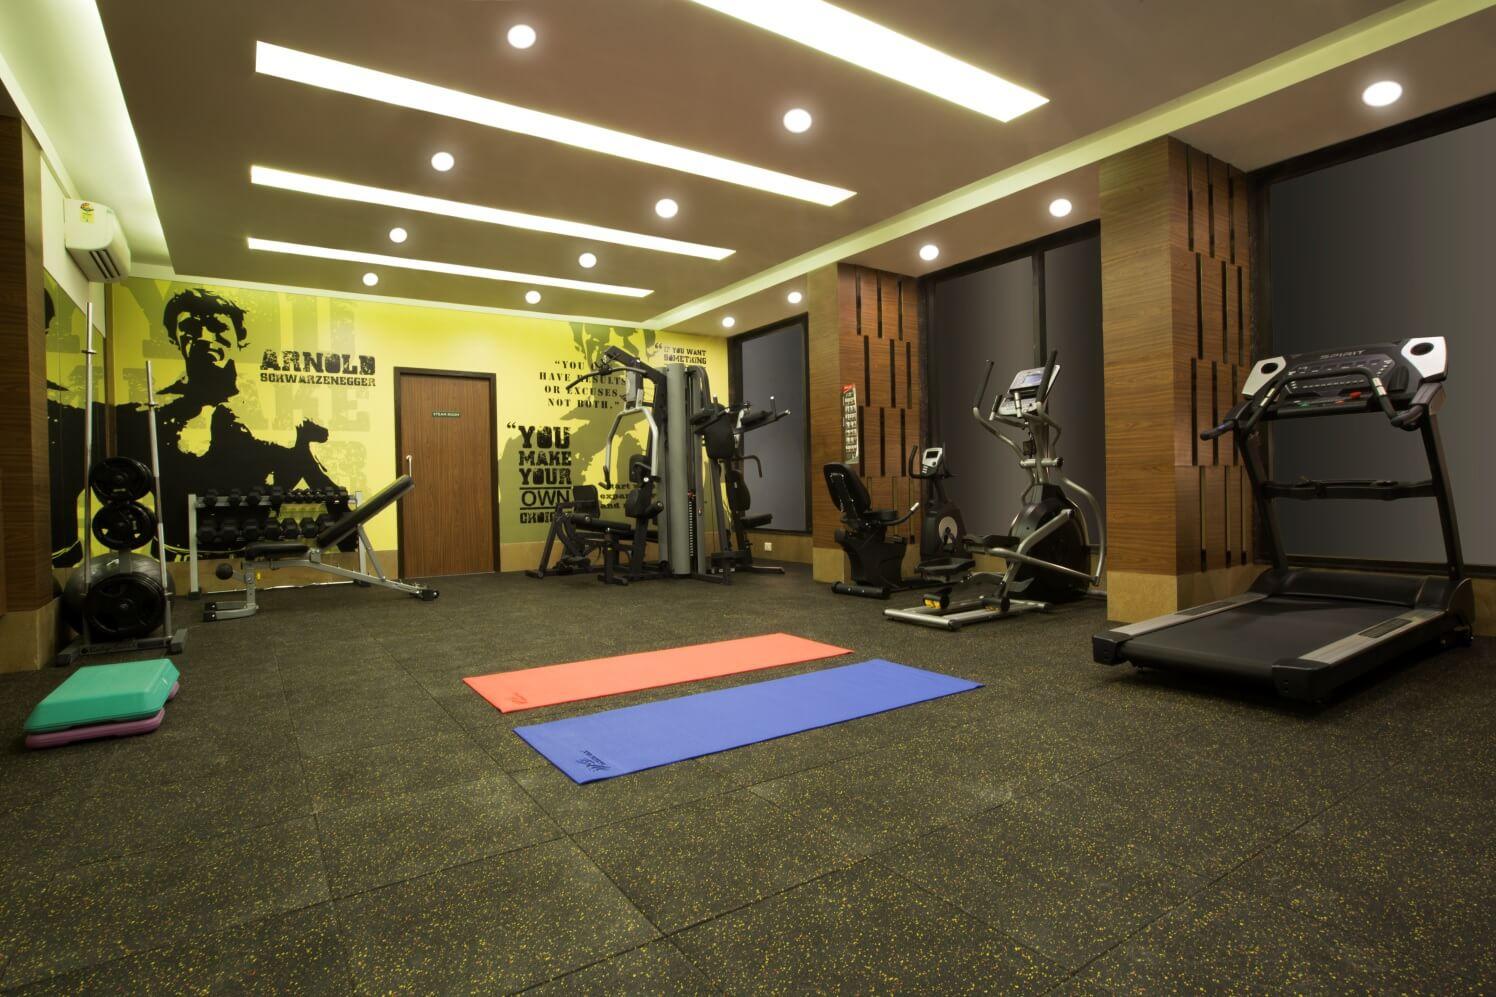 kaamdhenu celestia amenities features1